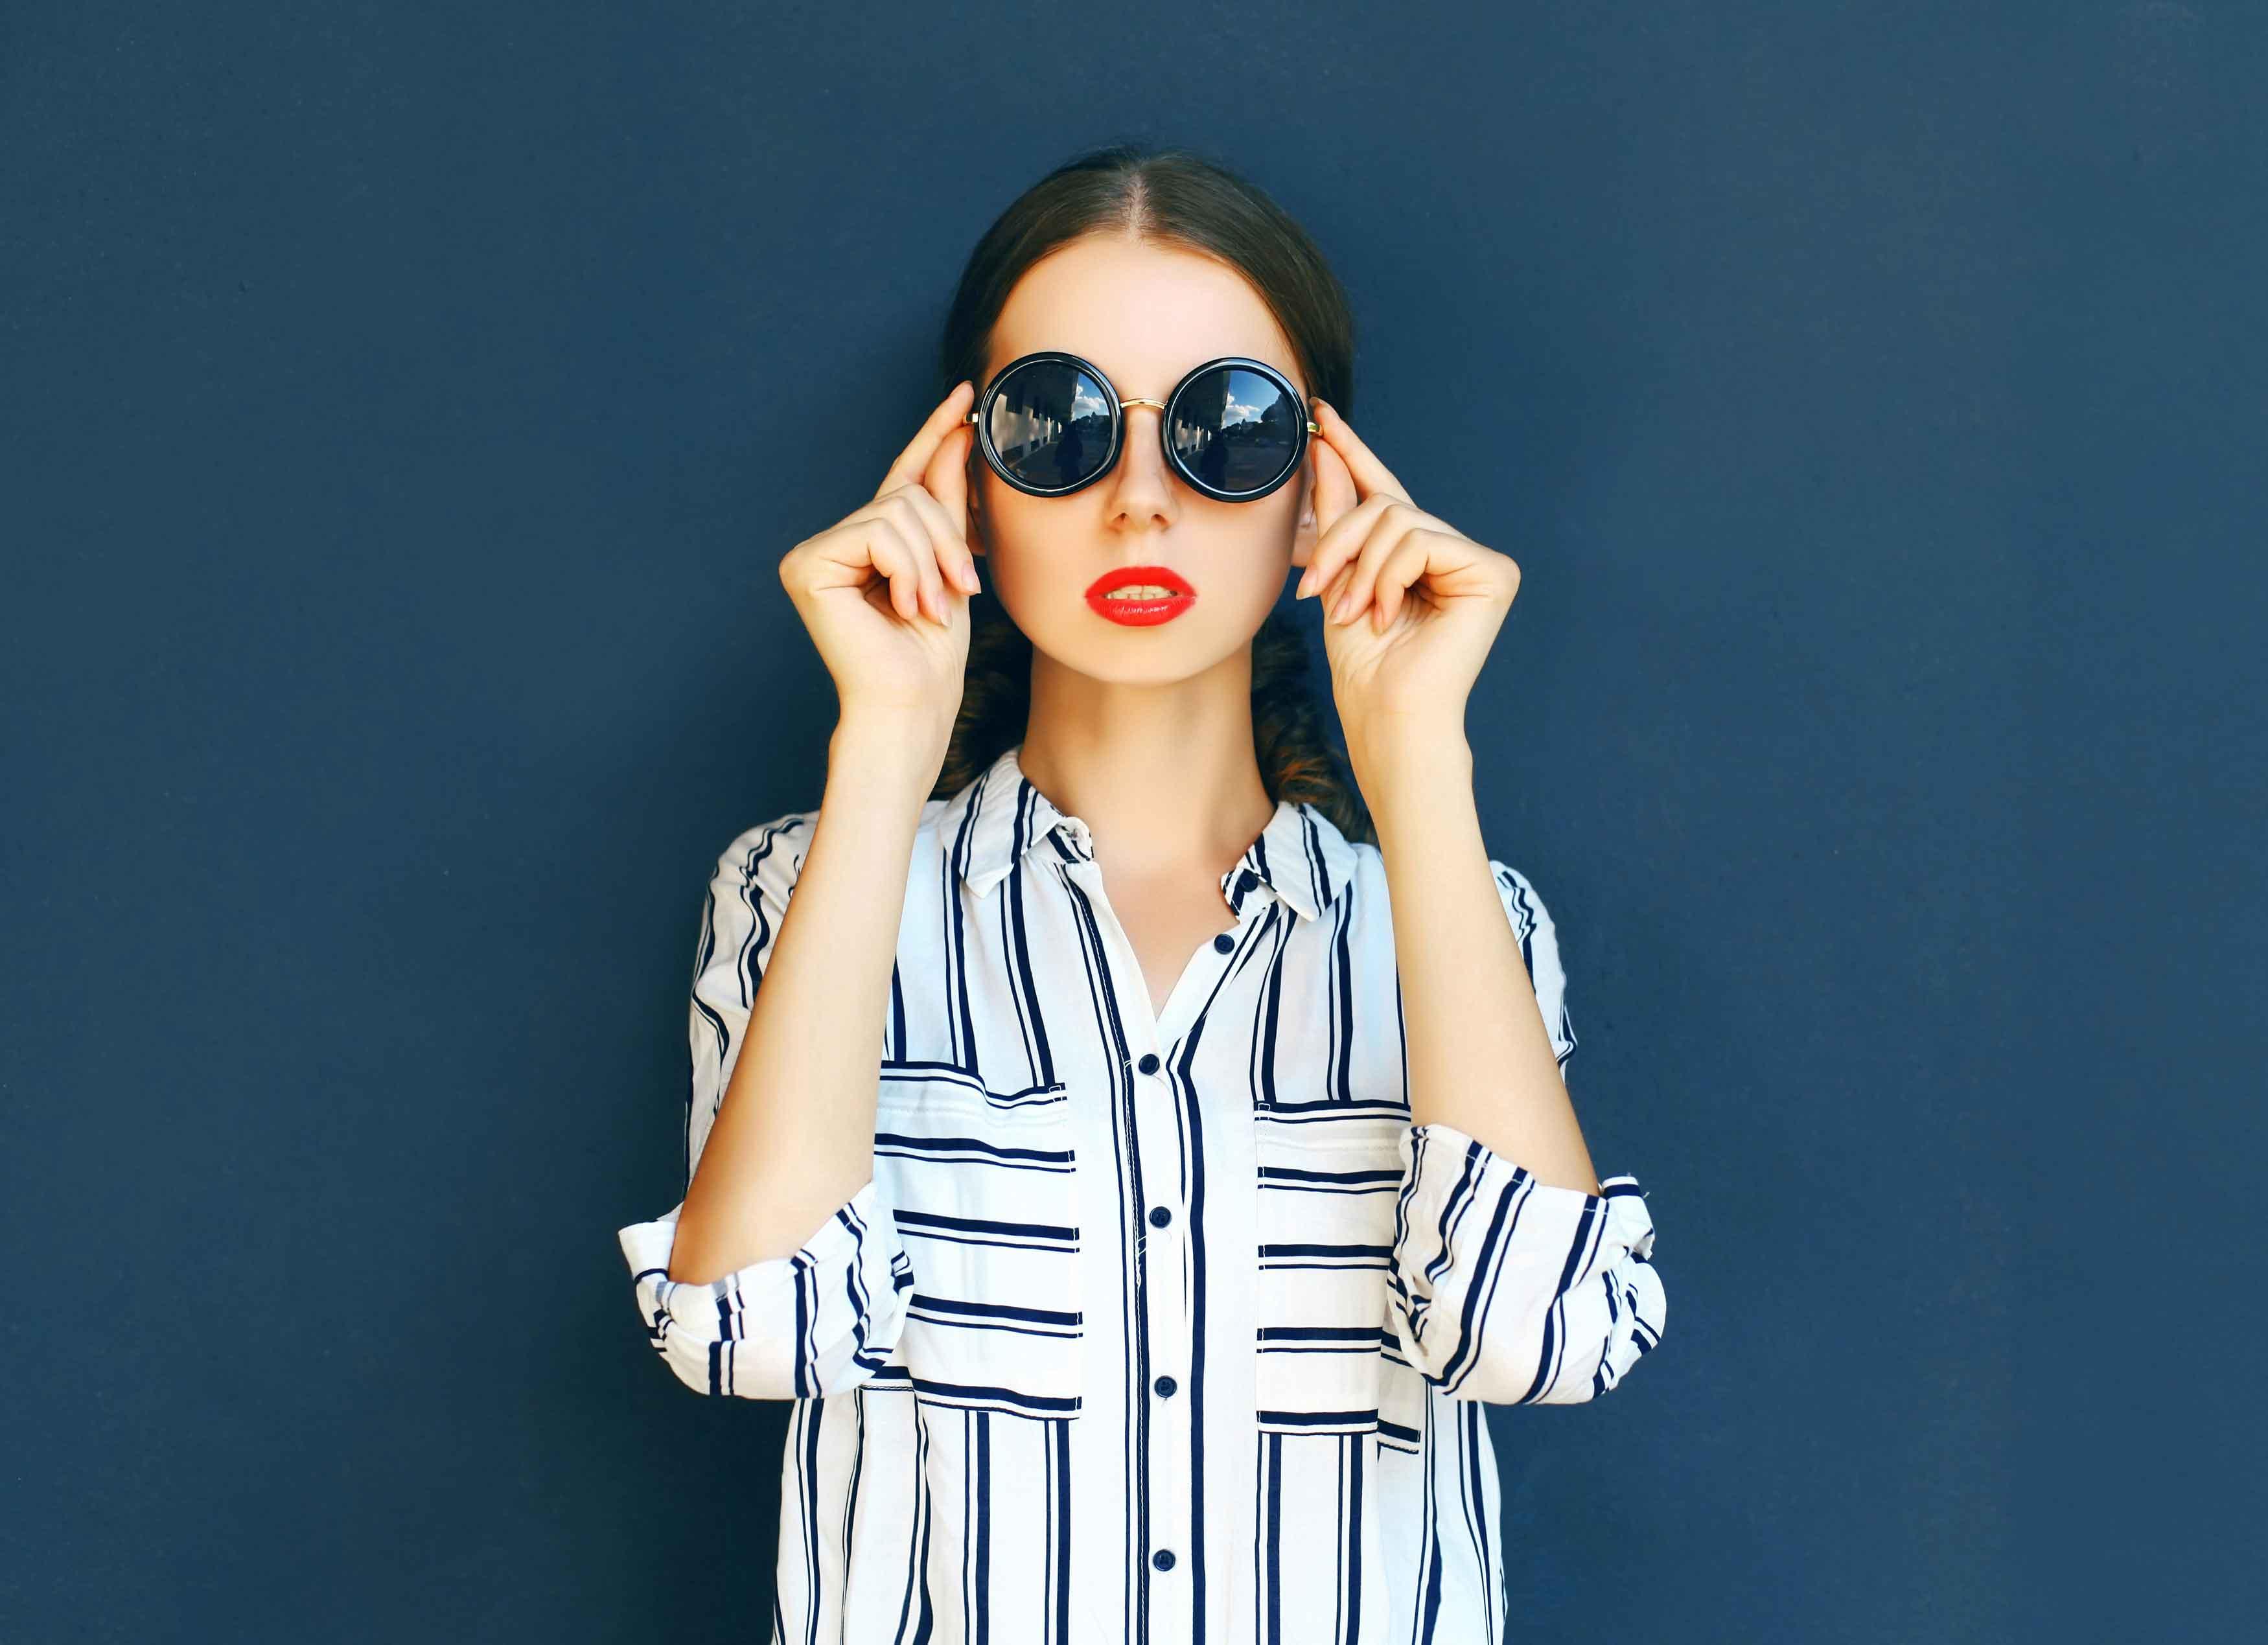 Br24 Composing: cool woman with dark sunglasses, blue stripes shirt in front of dark background before composing / Br24 Composing: coole Frau mit dunkler Sonnenbrille, gestreiftem Shirt vor dunklem Hintergrund bevor Composing